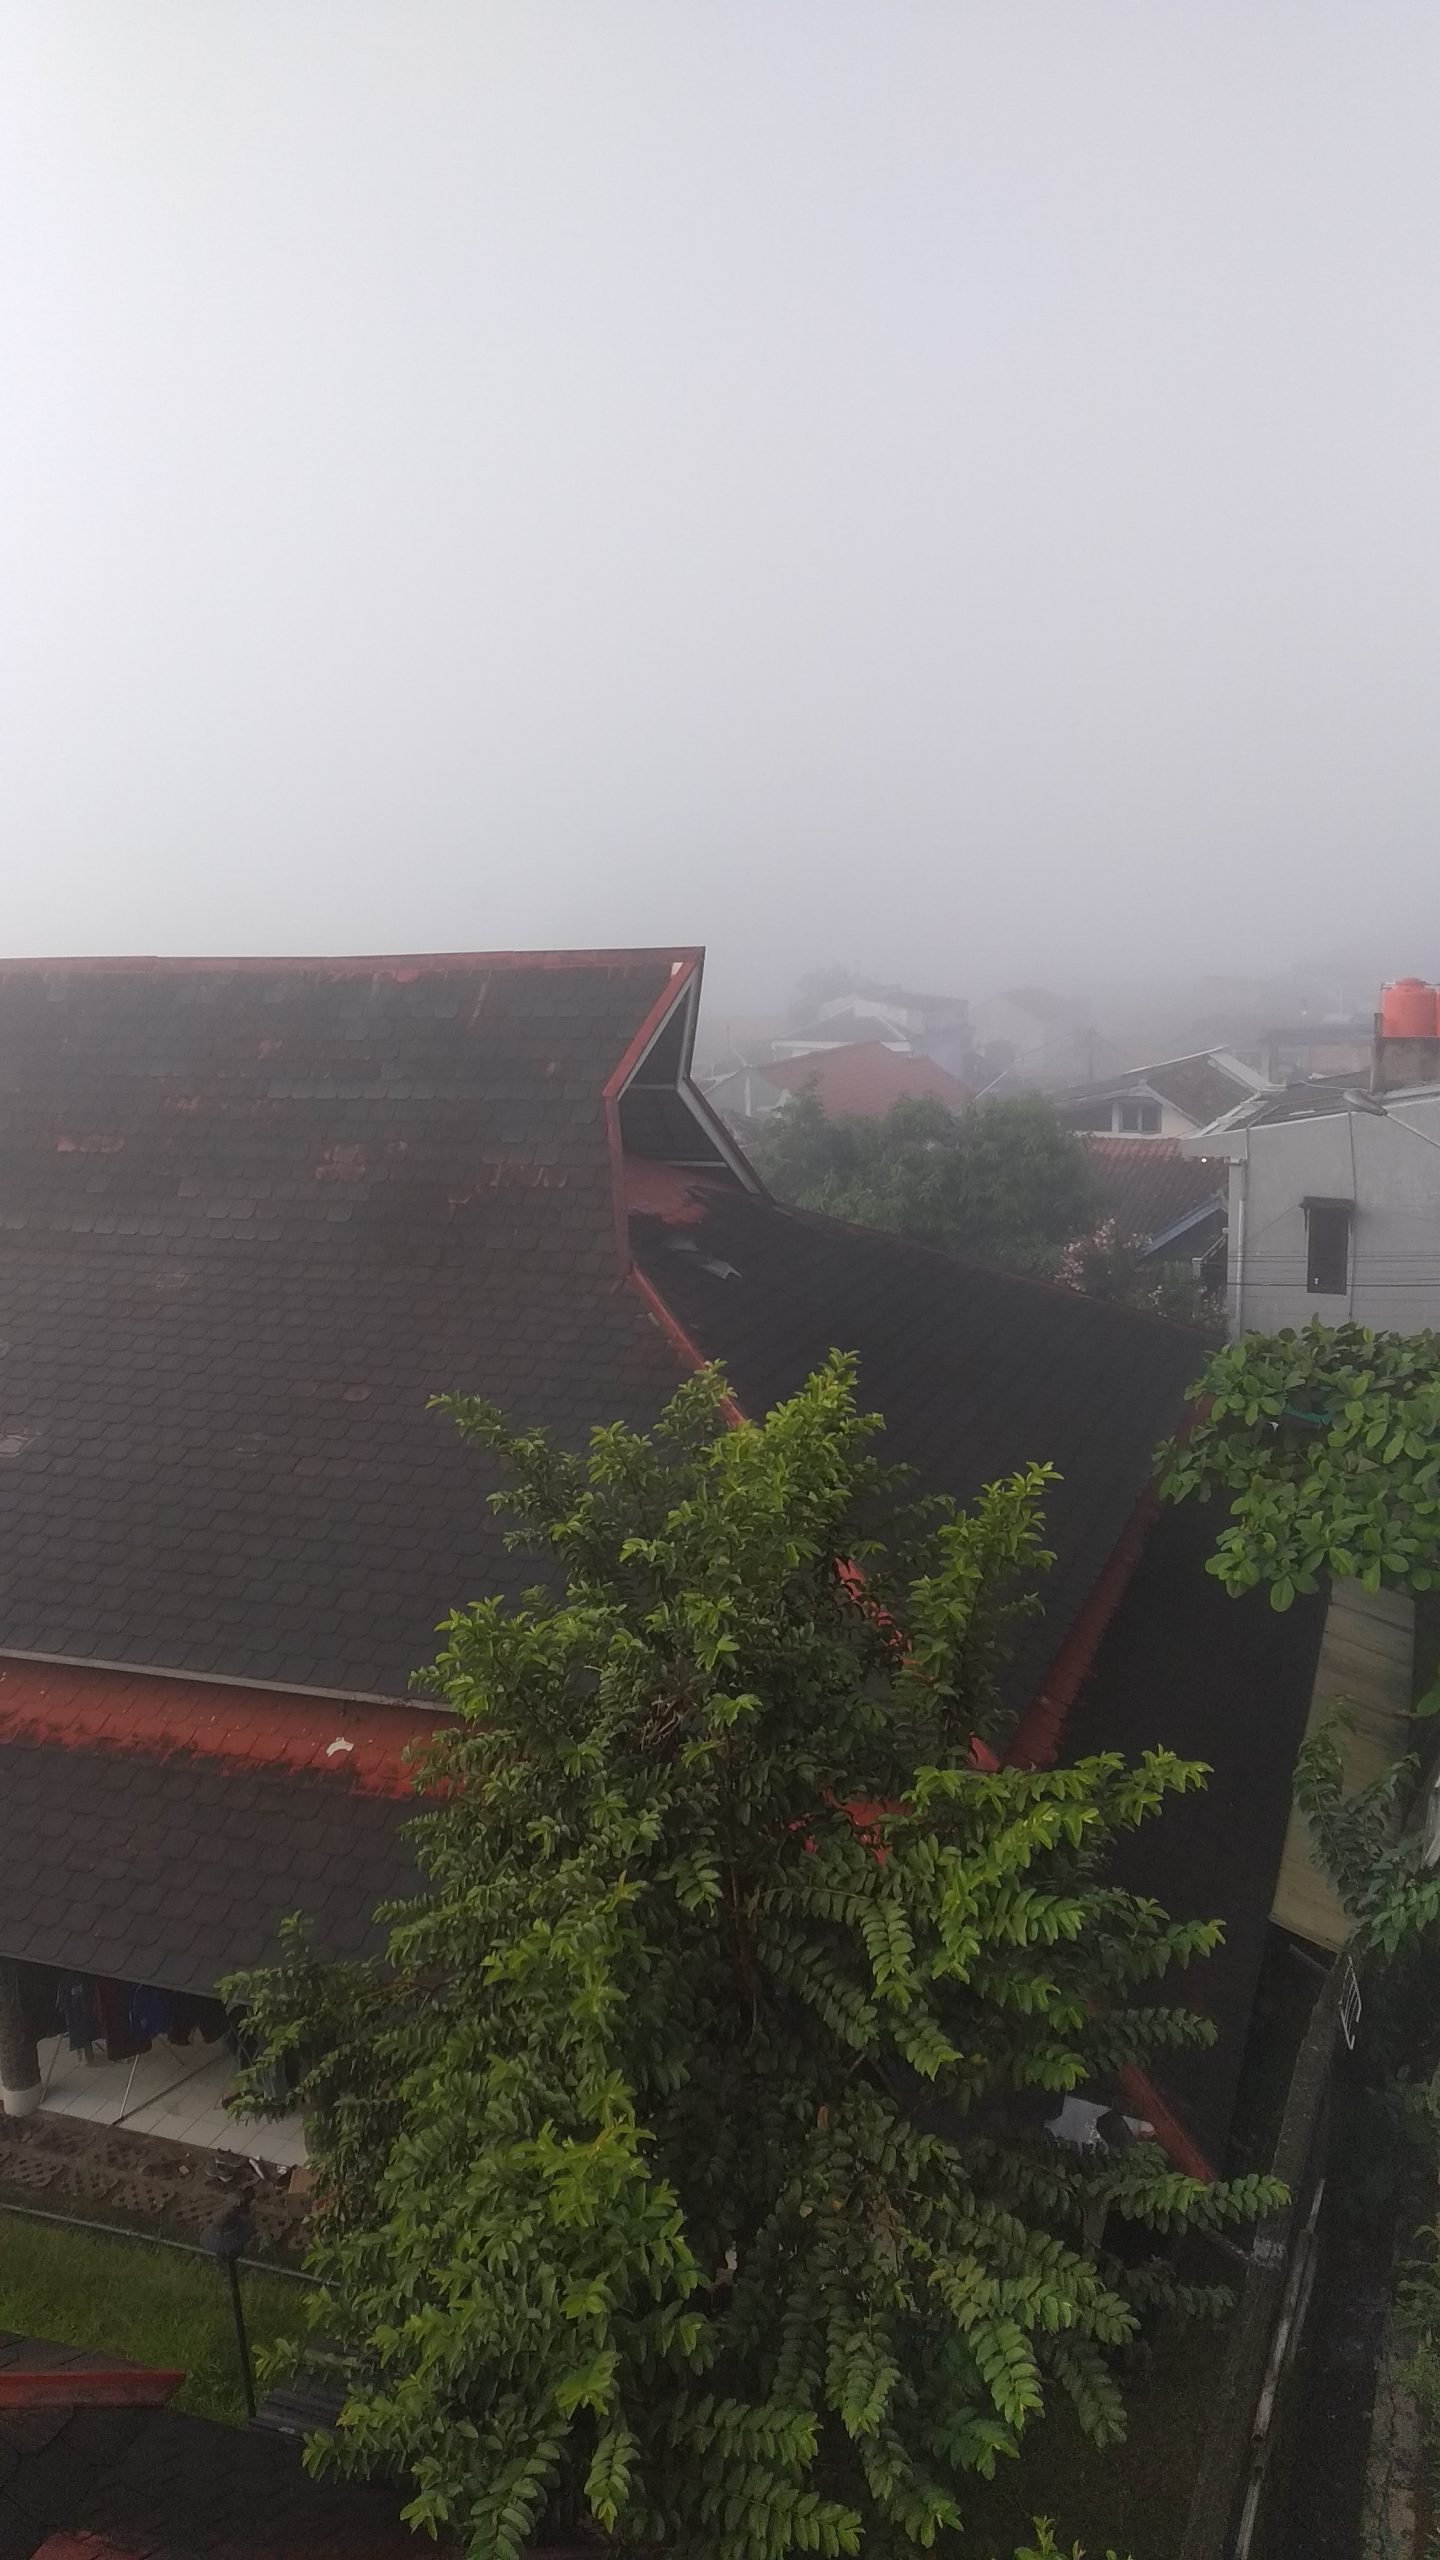 Foggy Morning in Bandung on April 29th, 2020 at 06.55